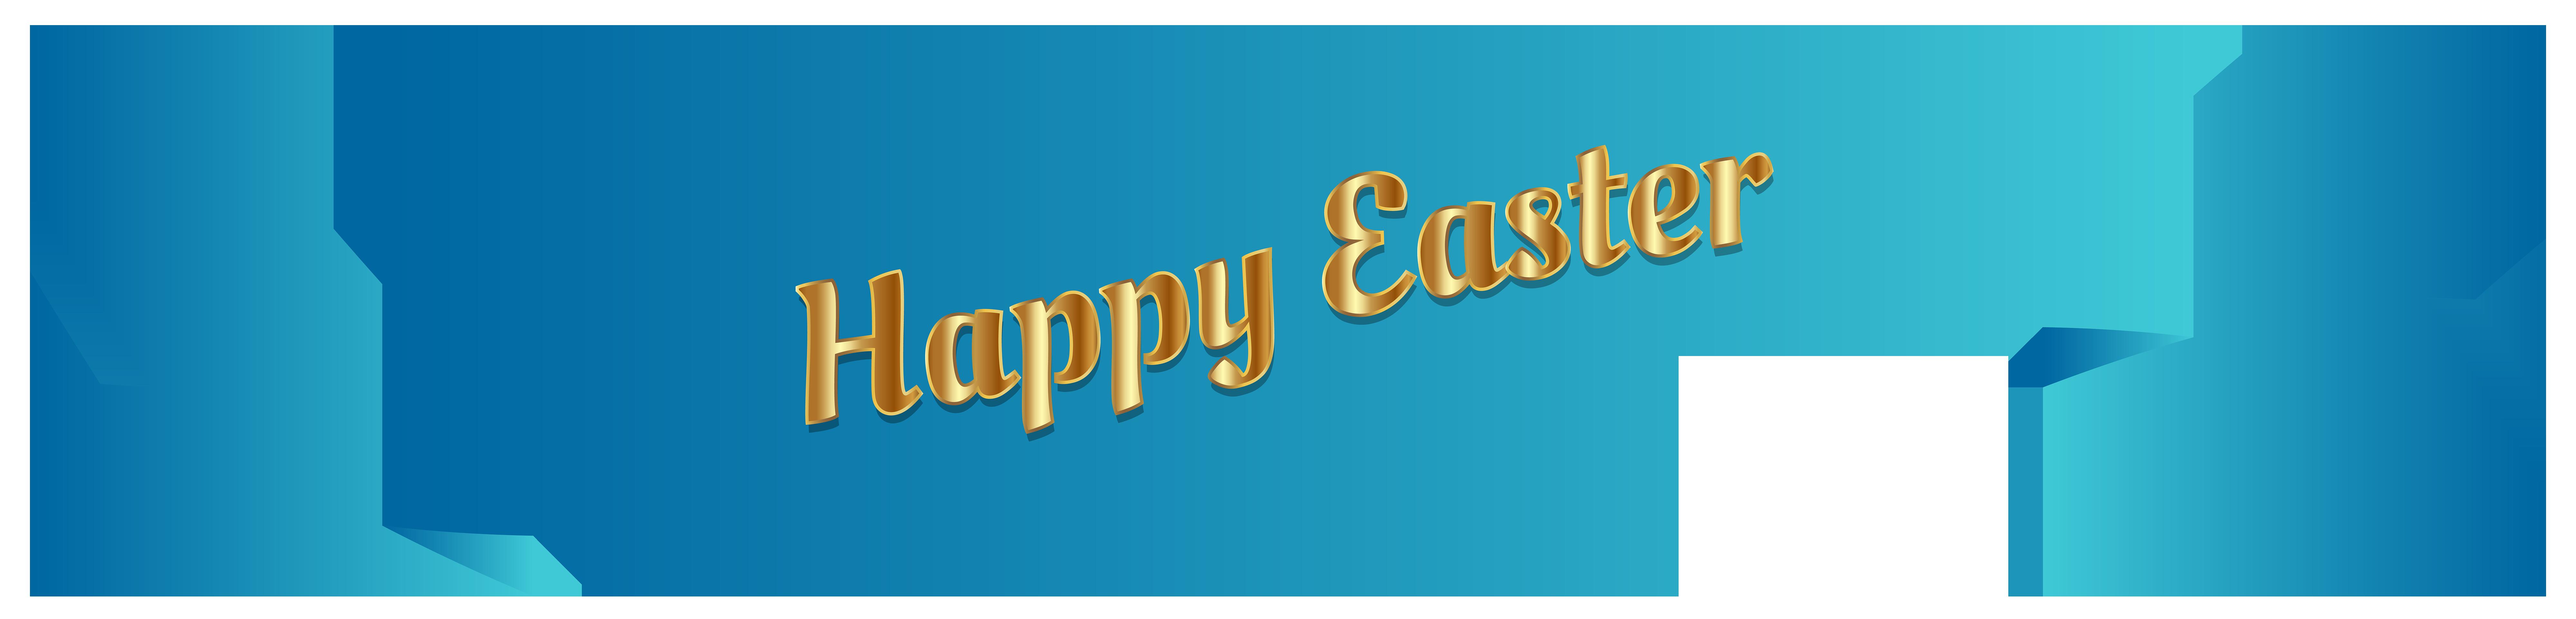 Easter Banner Clipart - ClipArt Best